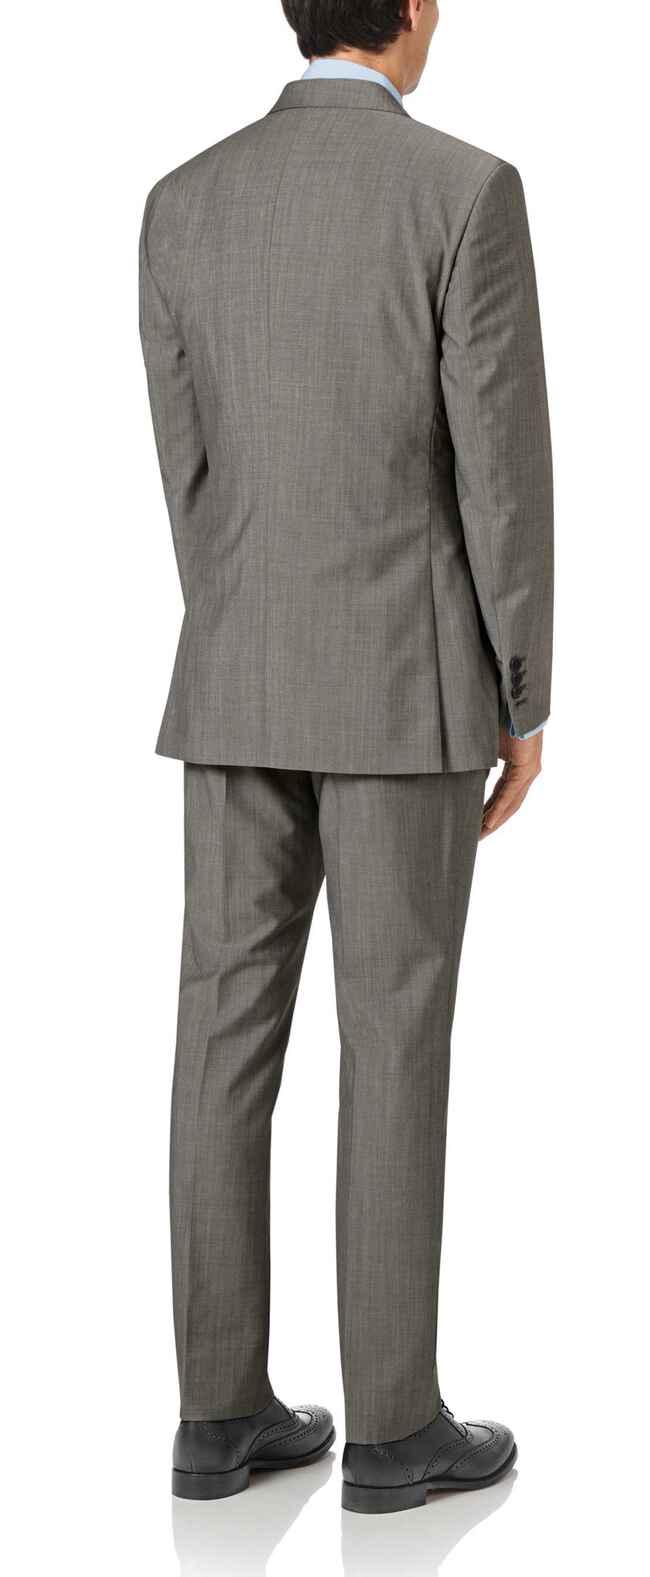 Costume gris en luxueuse laine italienne slim fit